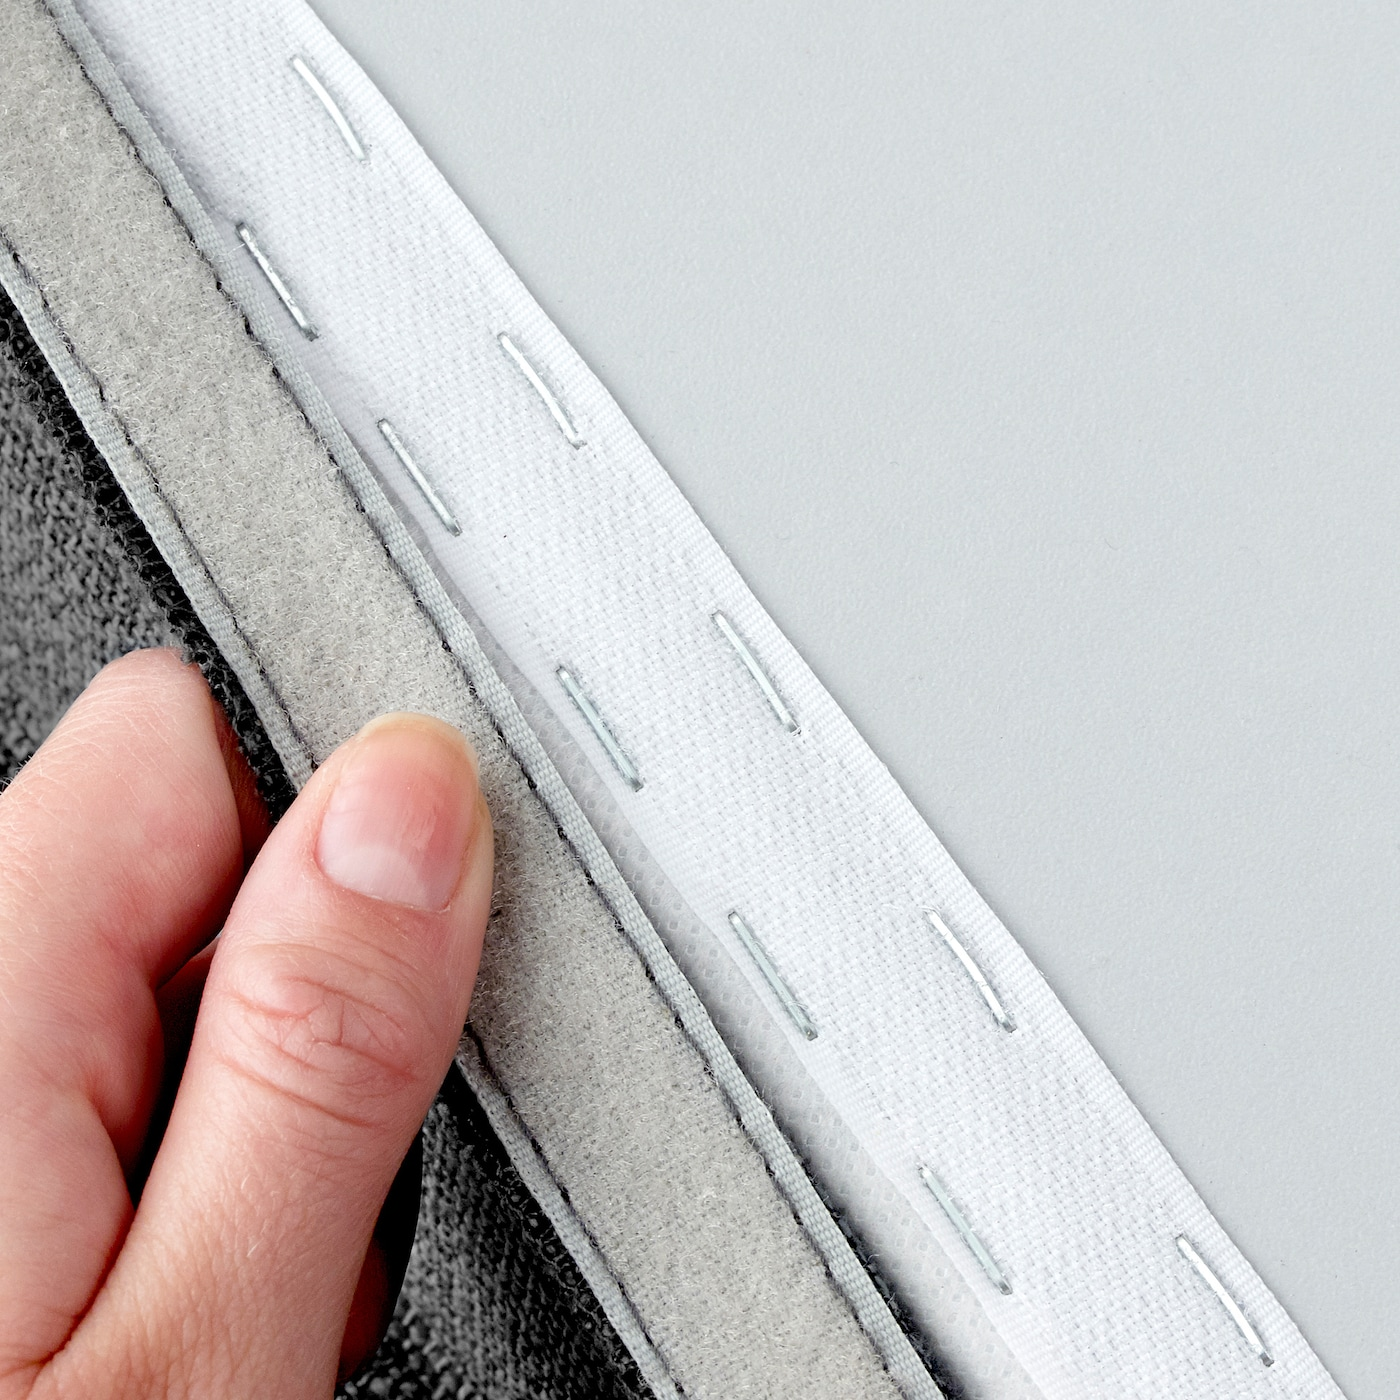 Nouveau Ikea Vallentuna Housse pour Siège Module avec rangement Ramna beige 003.295.87